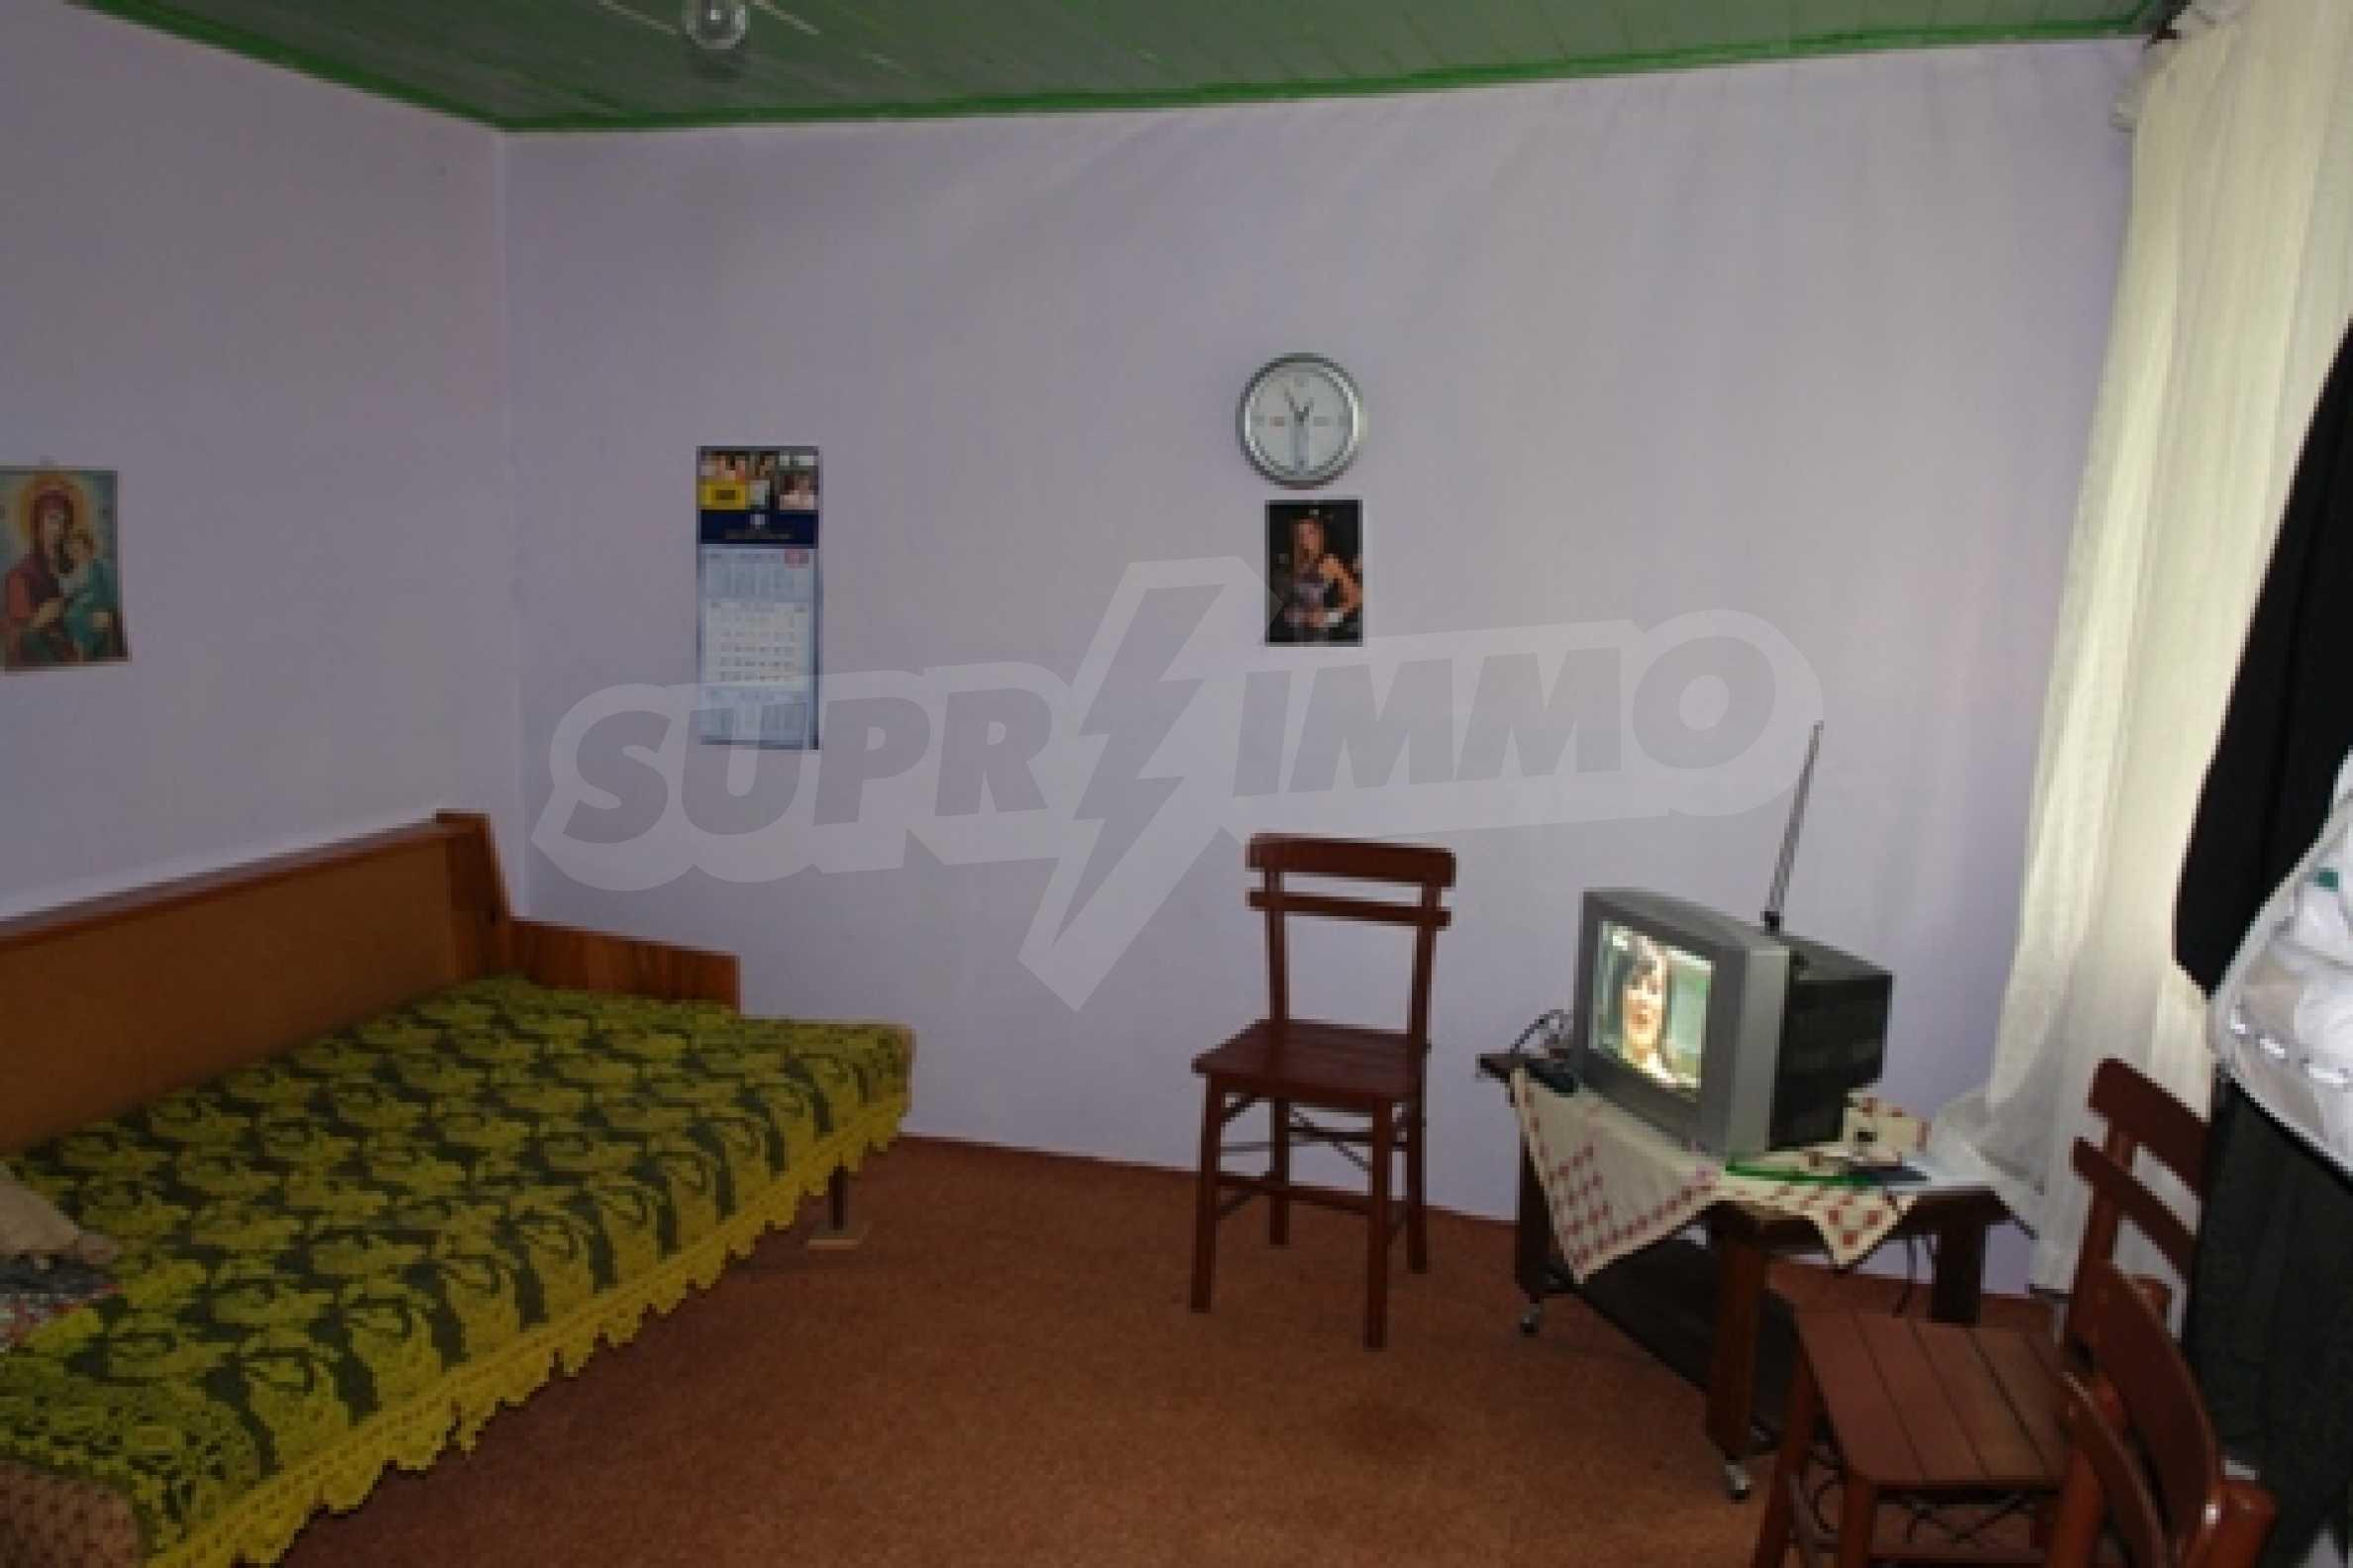 Spacious two-storey 4-bedroom house in Trastenik village, Ruse district 6